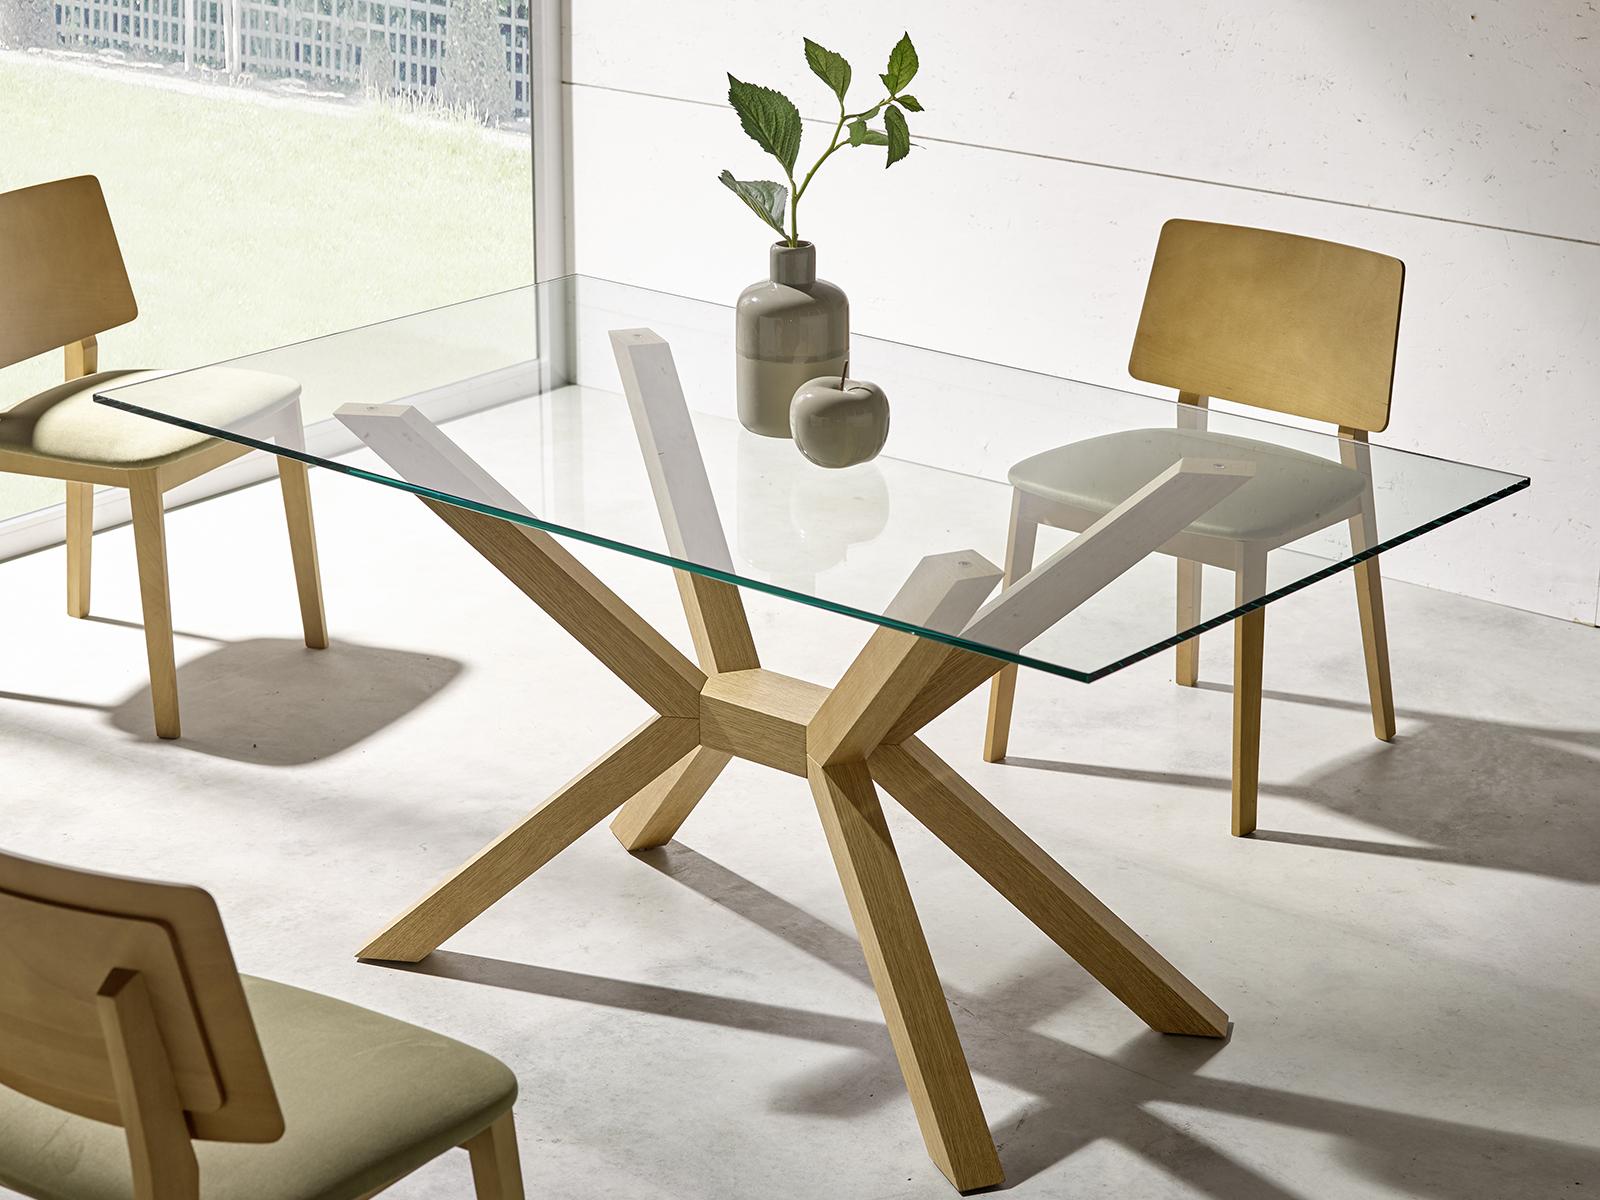 Venta de mesas de diseño, decoración e interiorismo